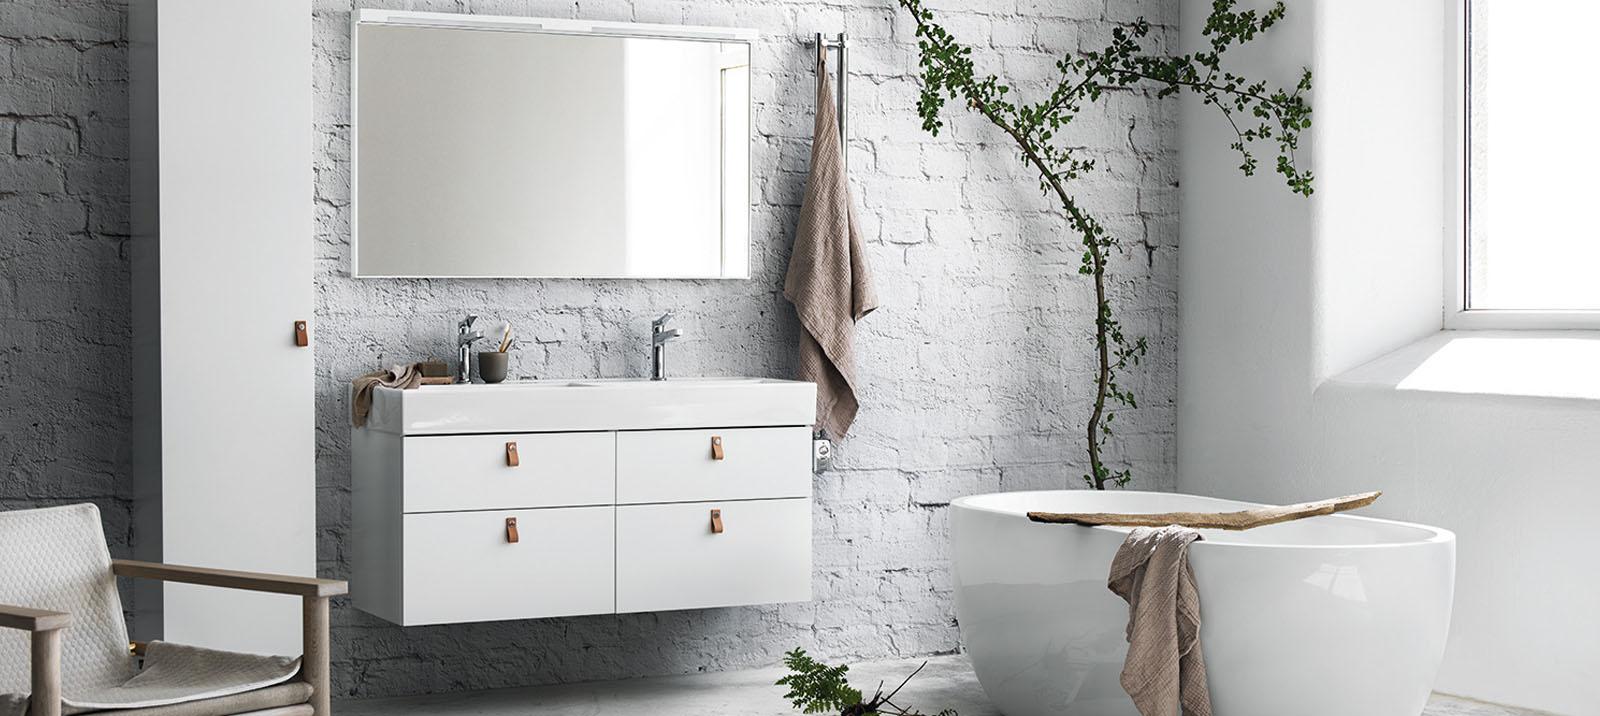 klassinen kylpyhuone ja amme